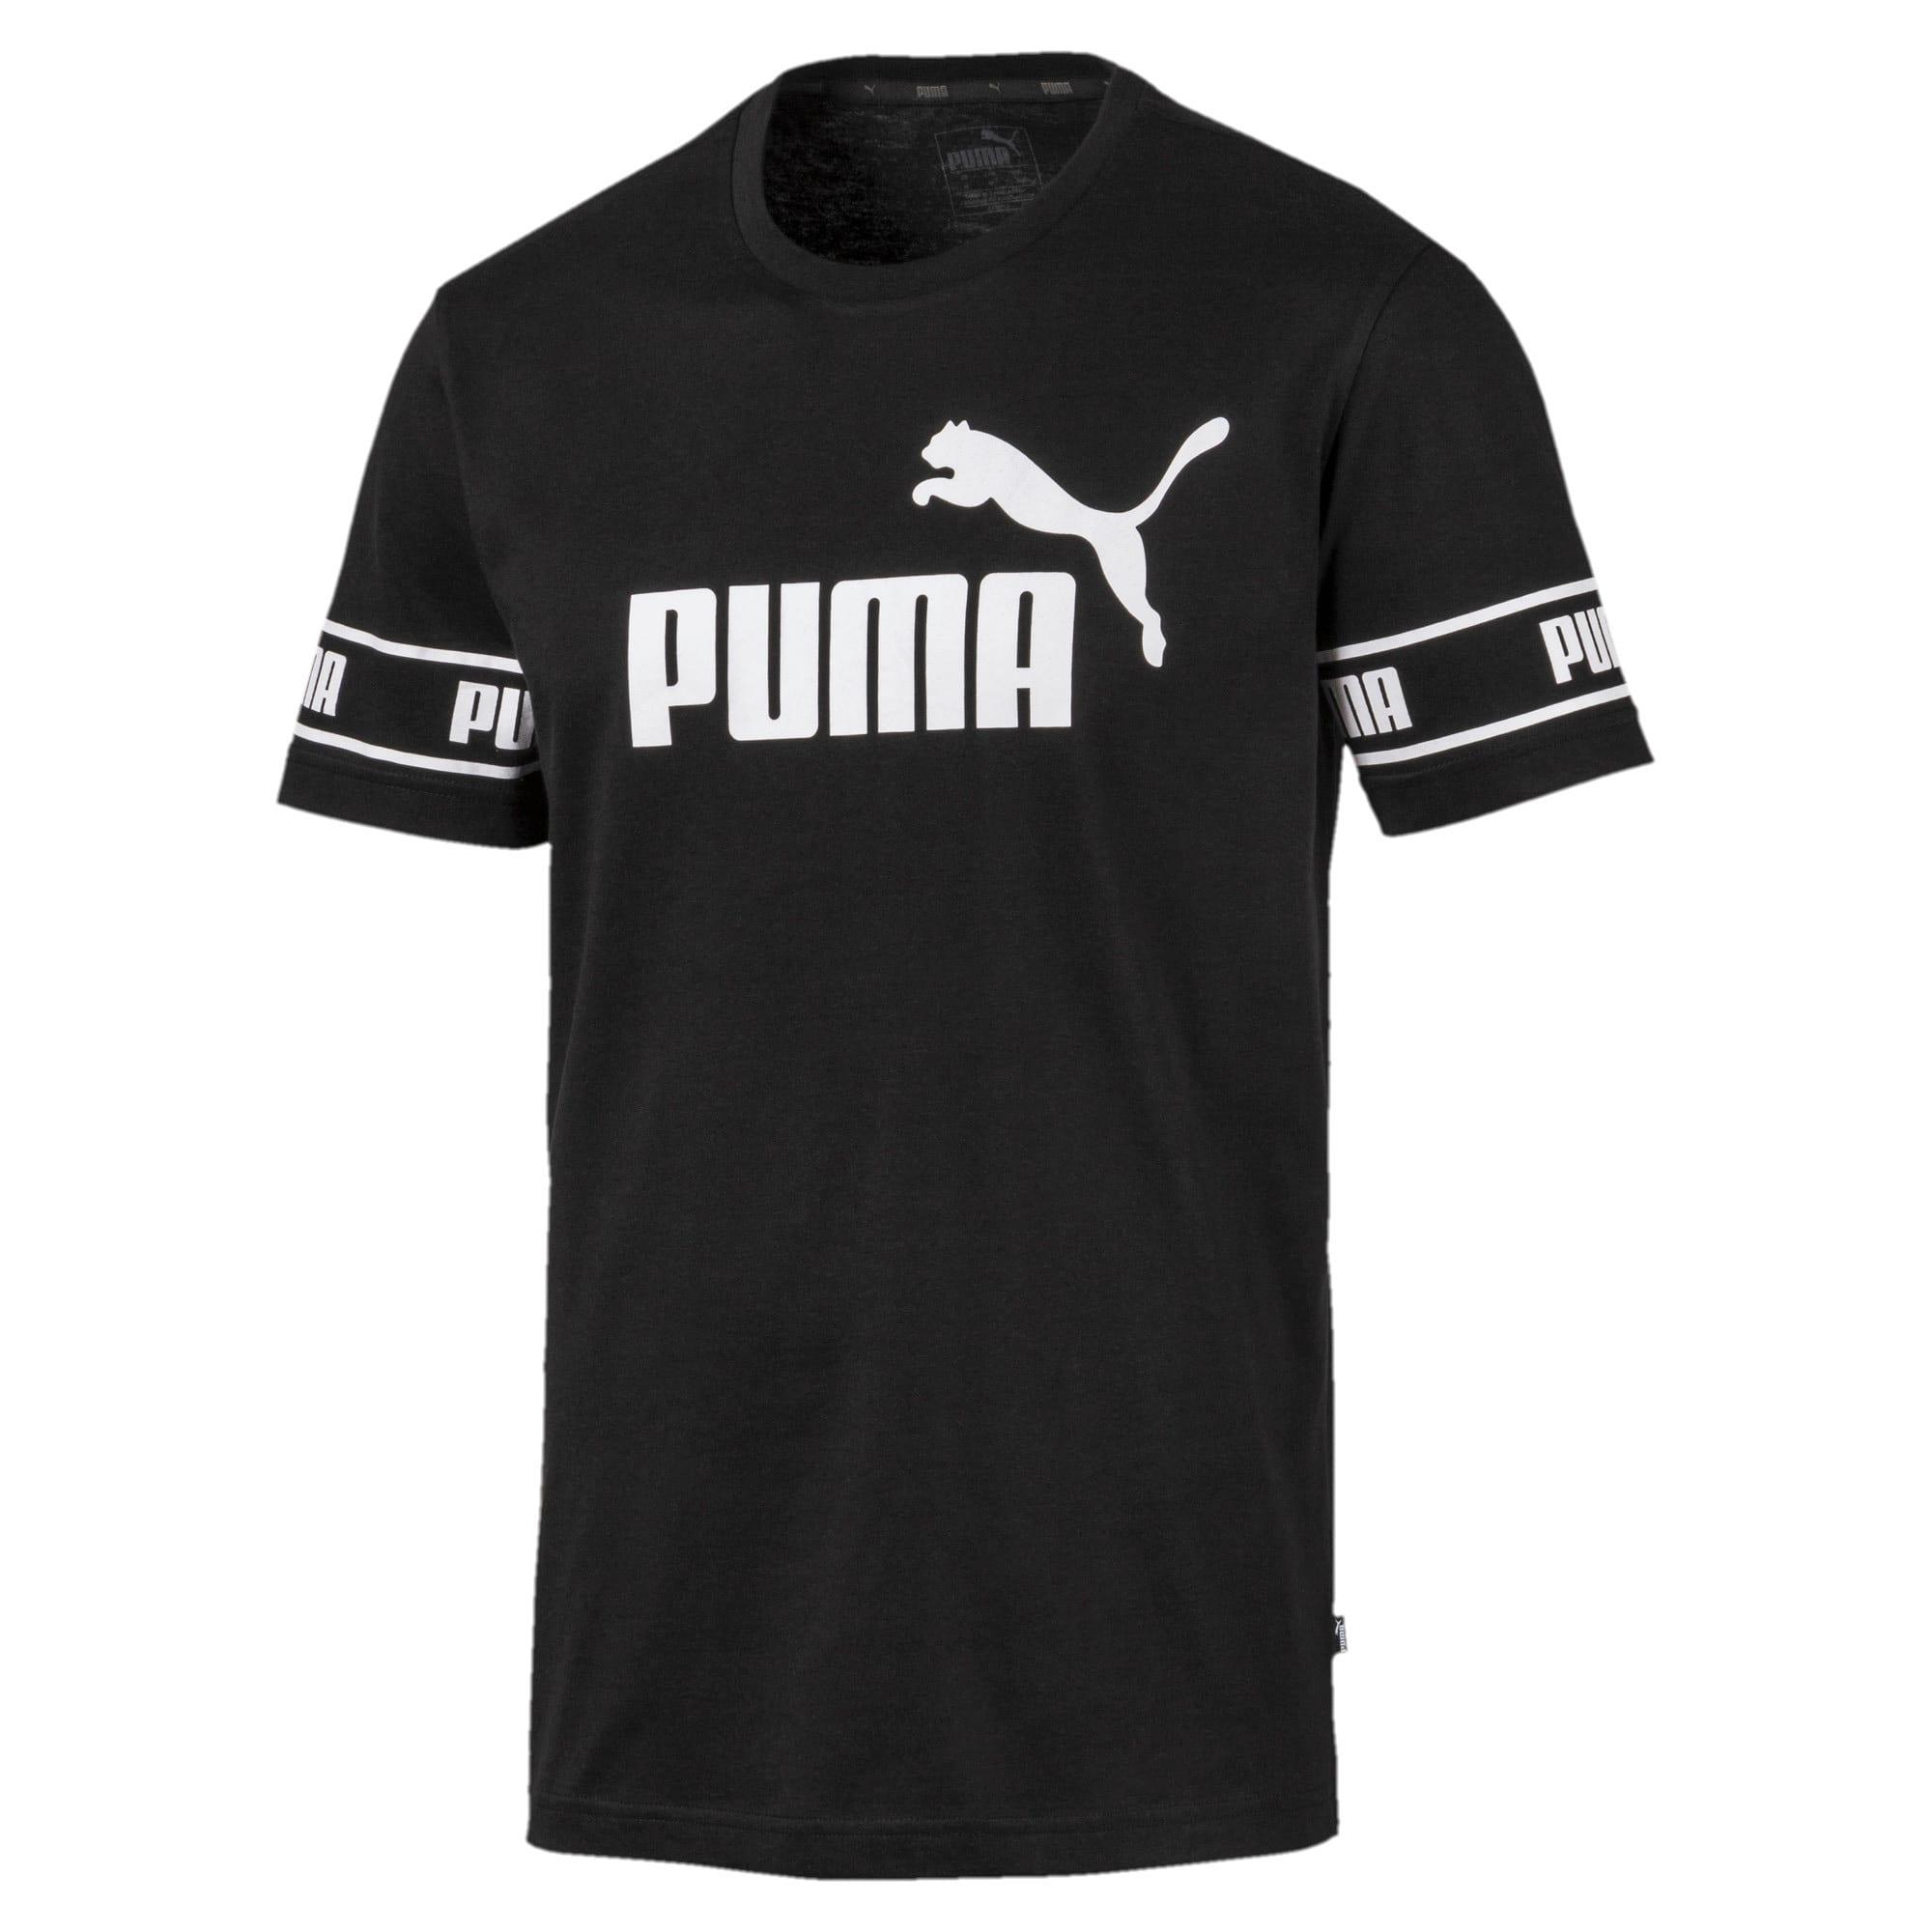 Thumbnail 4 of Amplified Men's Big Logo Tee, Puma Black, medium